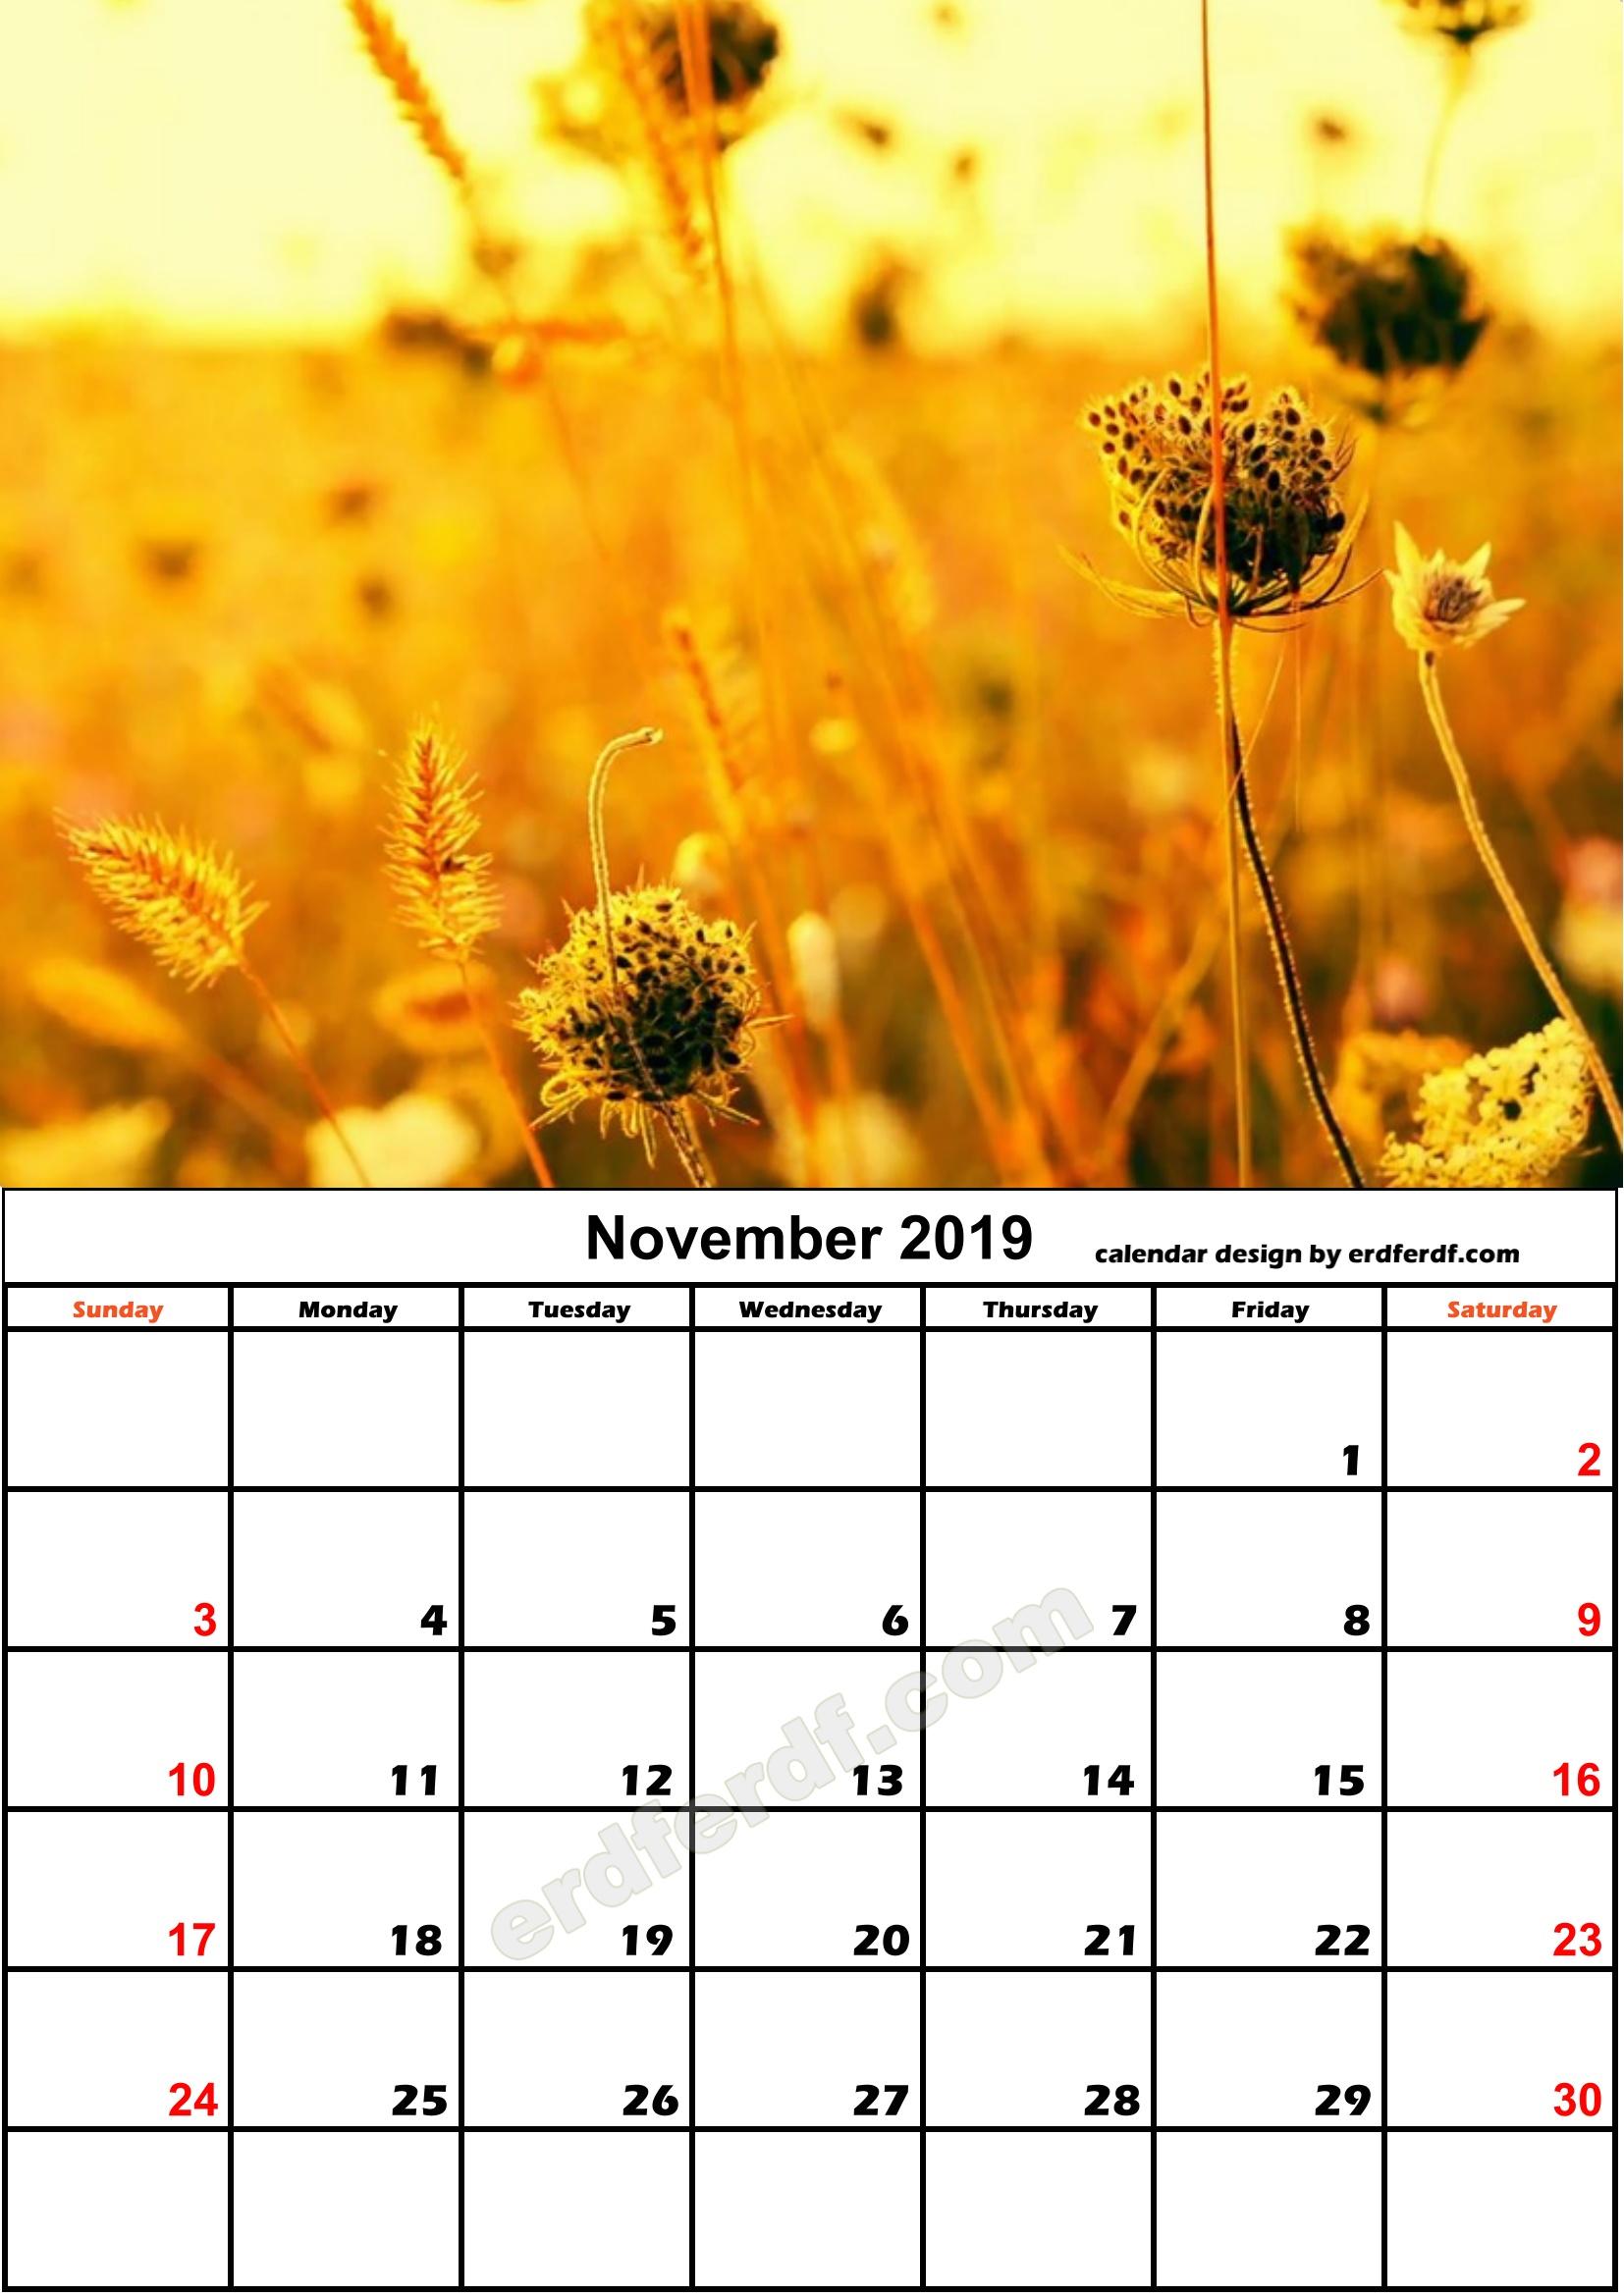 11 November Flower Nature Calendar Monthly 2019 Free Download